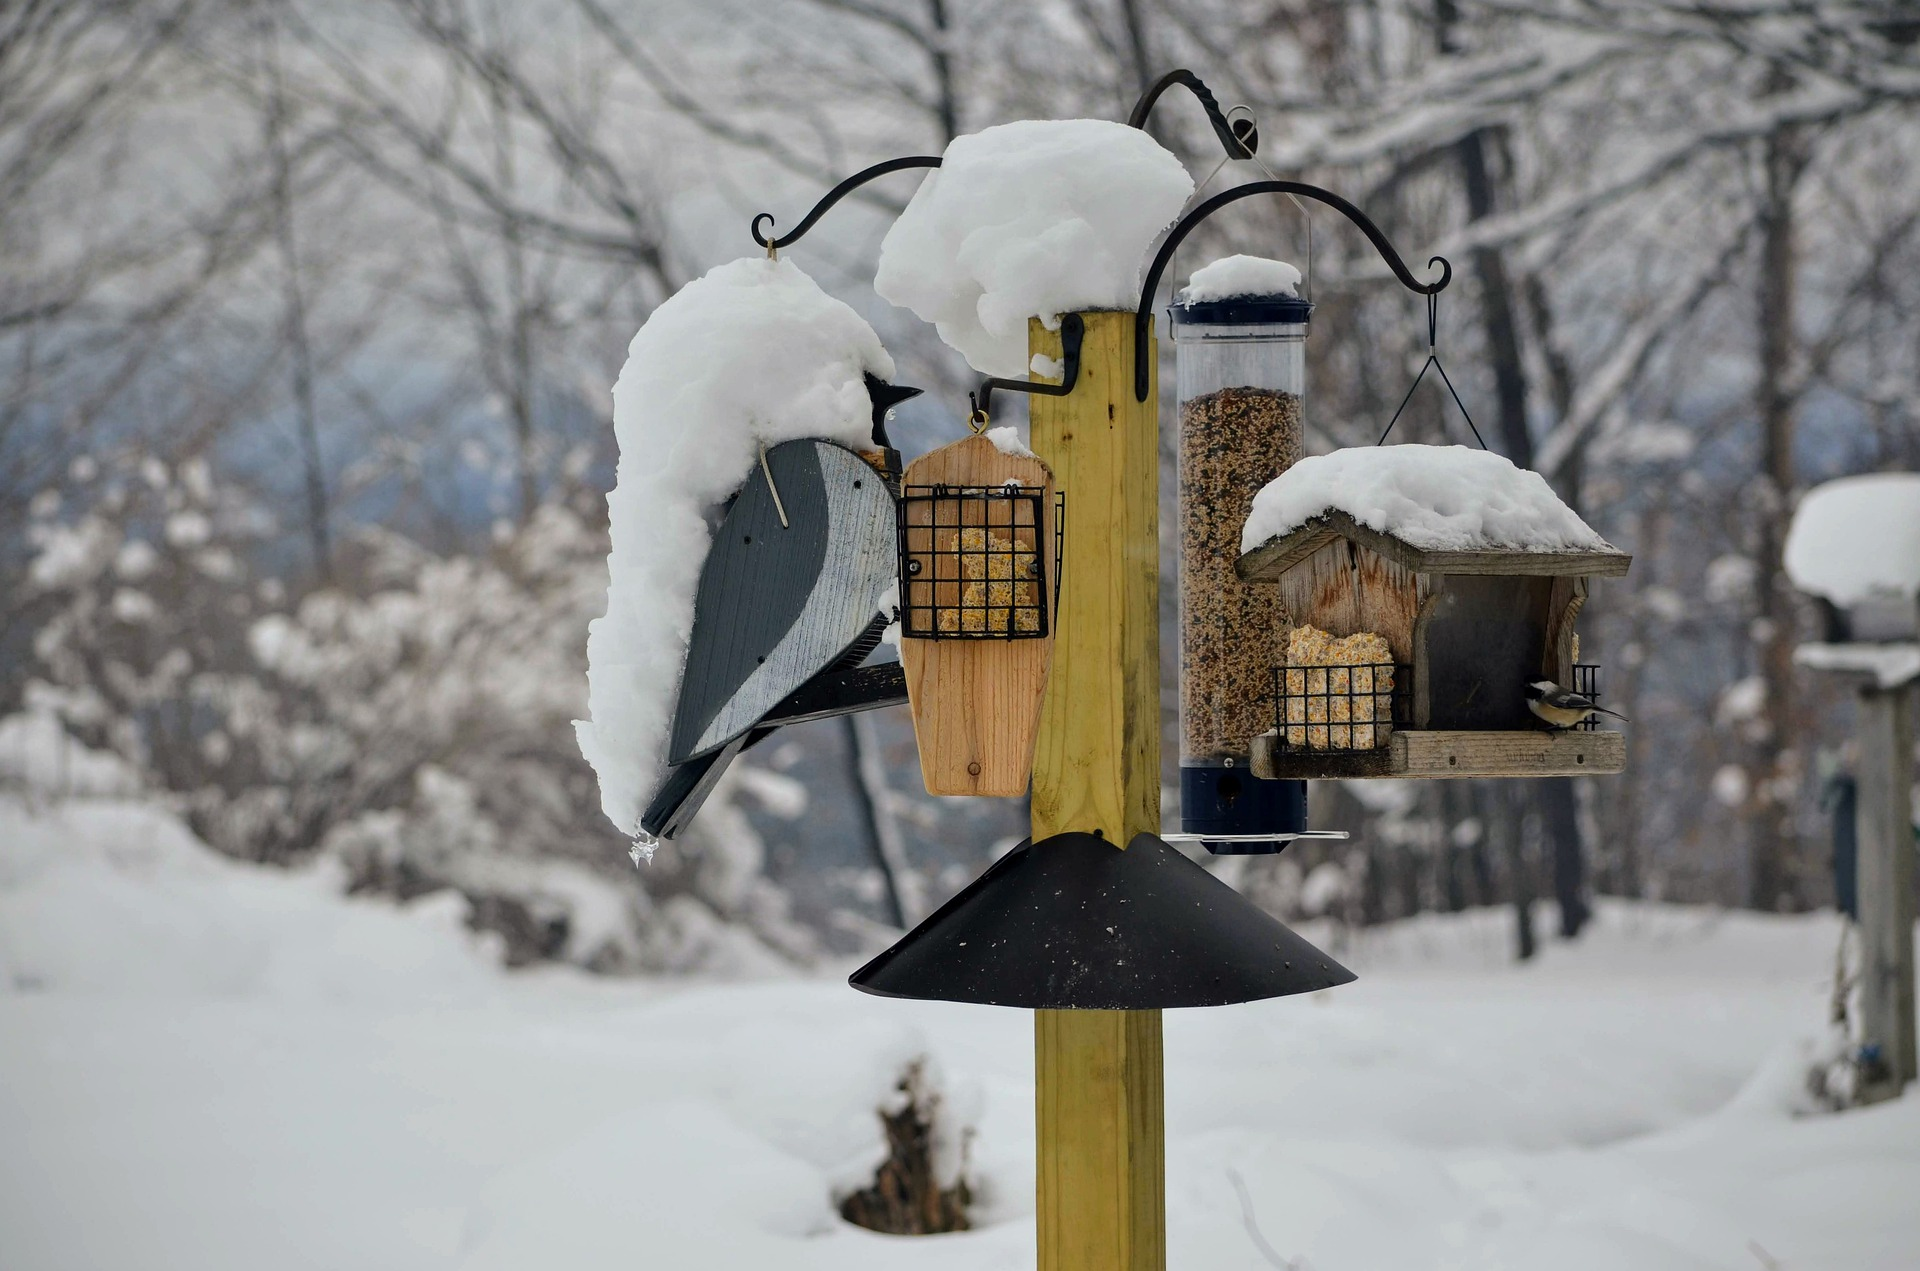 backyard bird feeders in winter snow